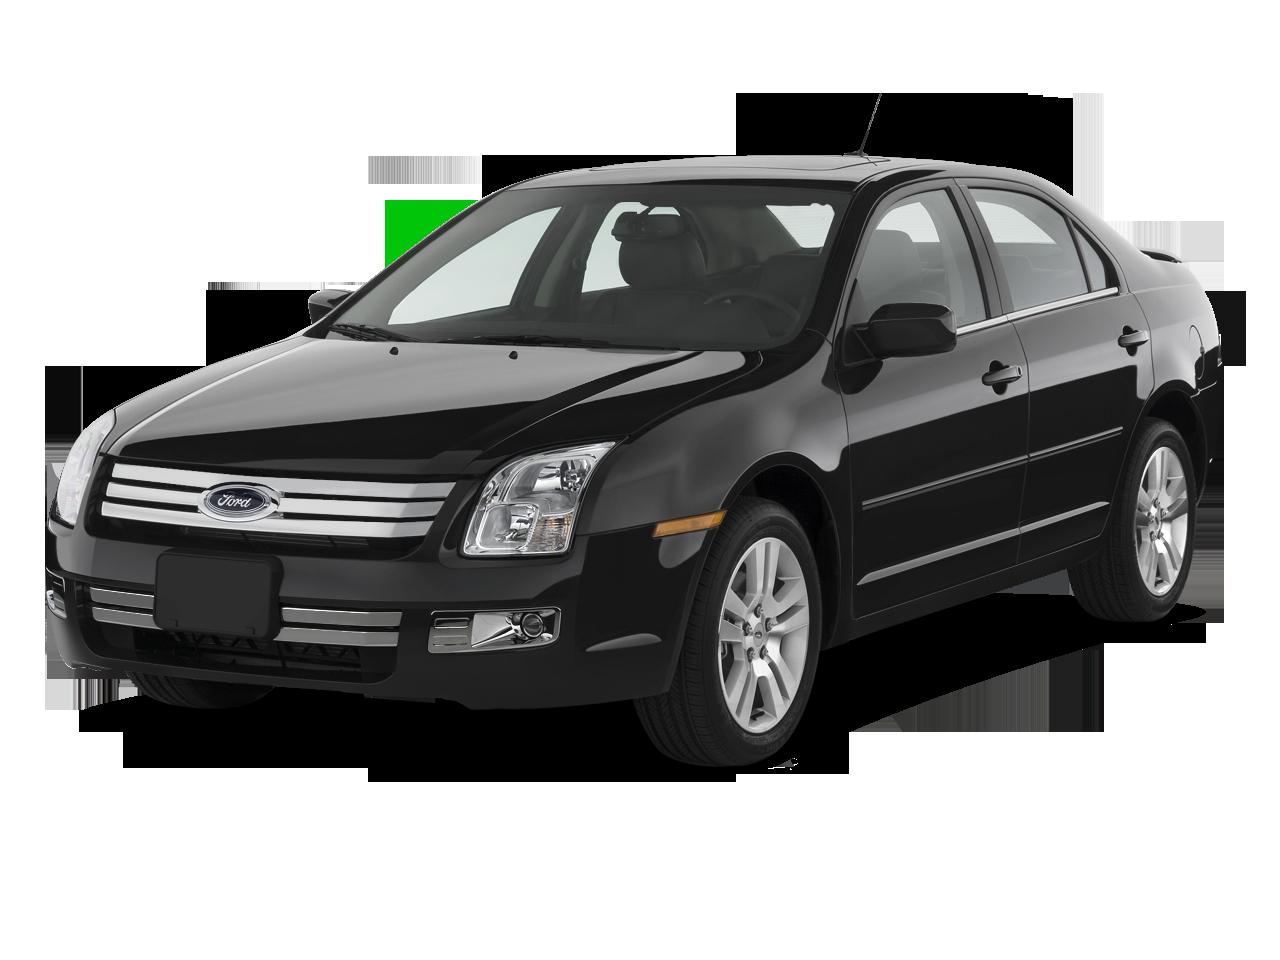 2009 Ford Fusion SEL AWD - Ford Midsize Sedan Review - Automobile Magazine